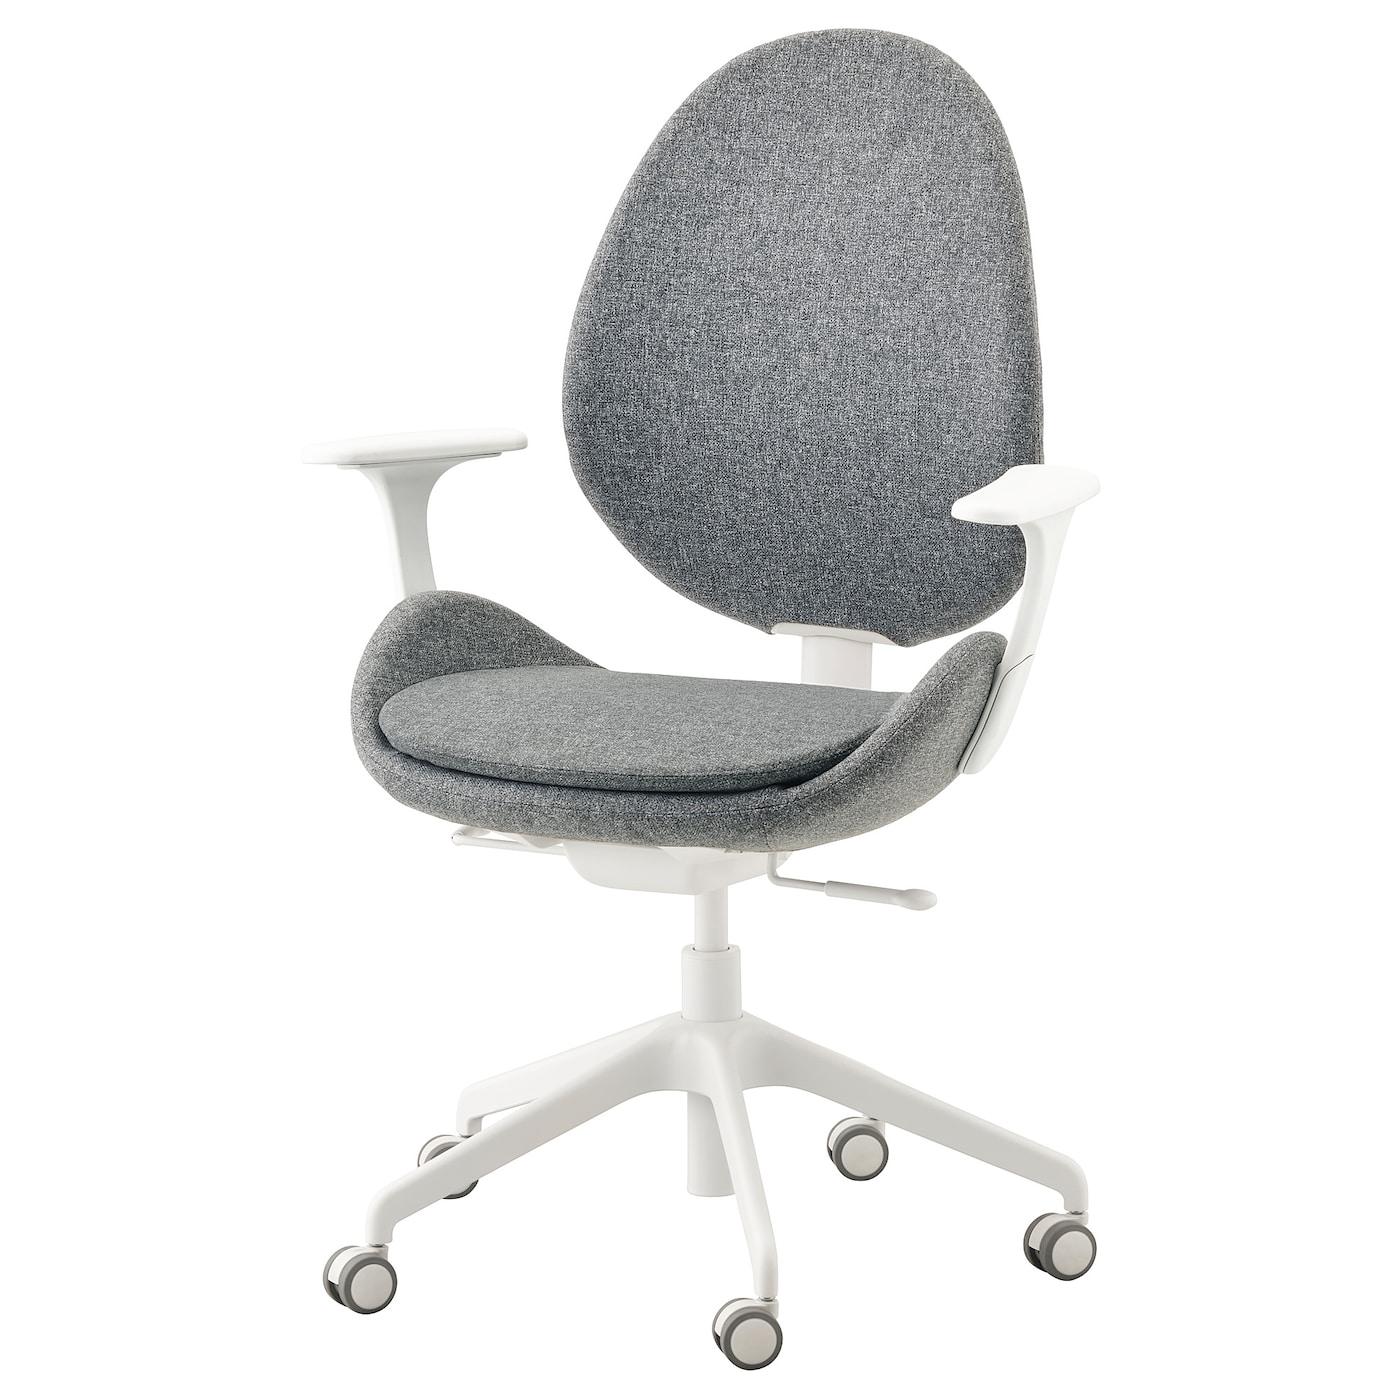 HATTEFJÄLL Office chair with armrests Gunnared medium grey, white